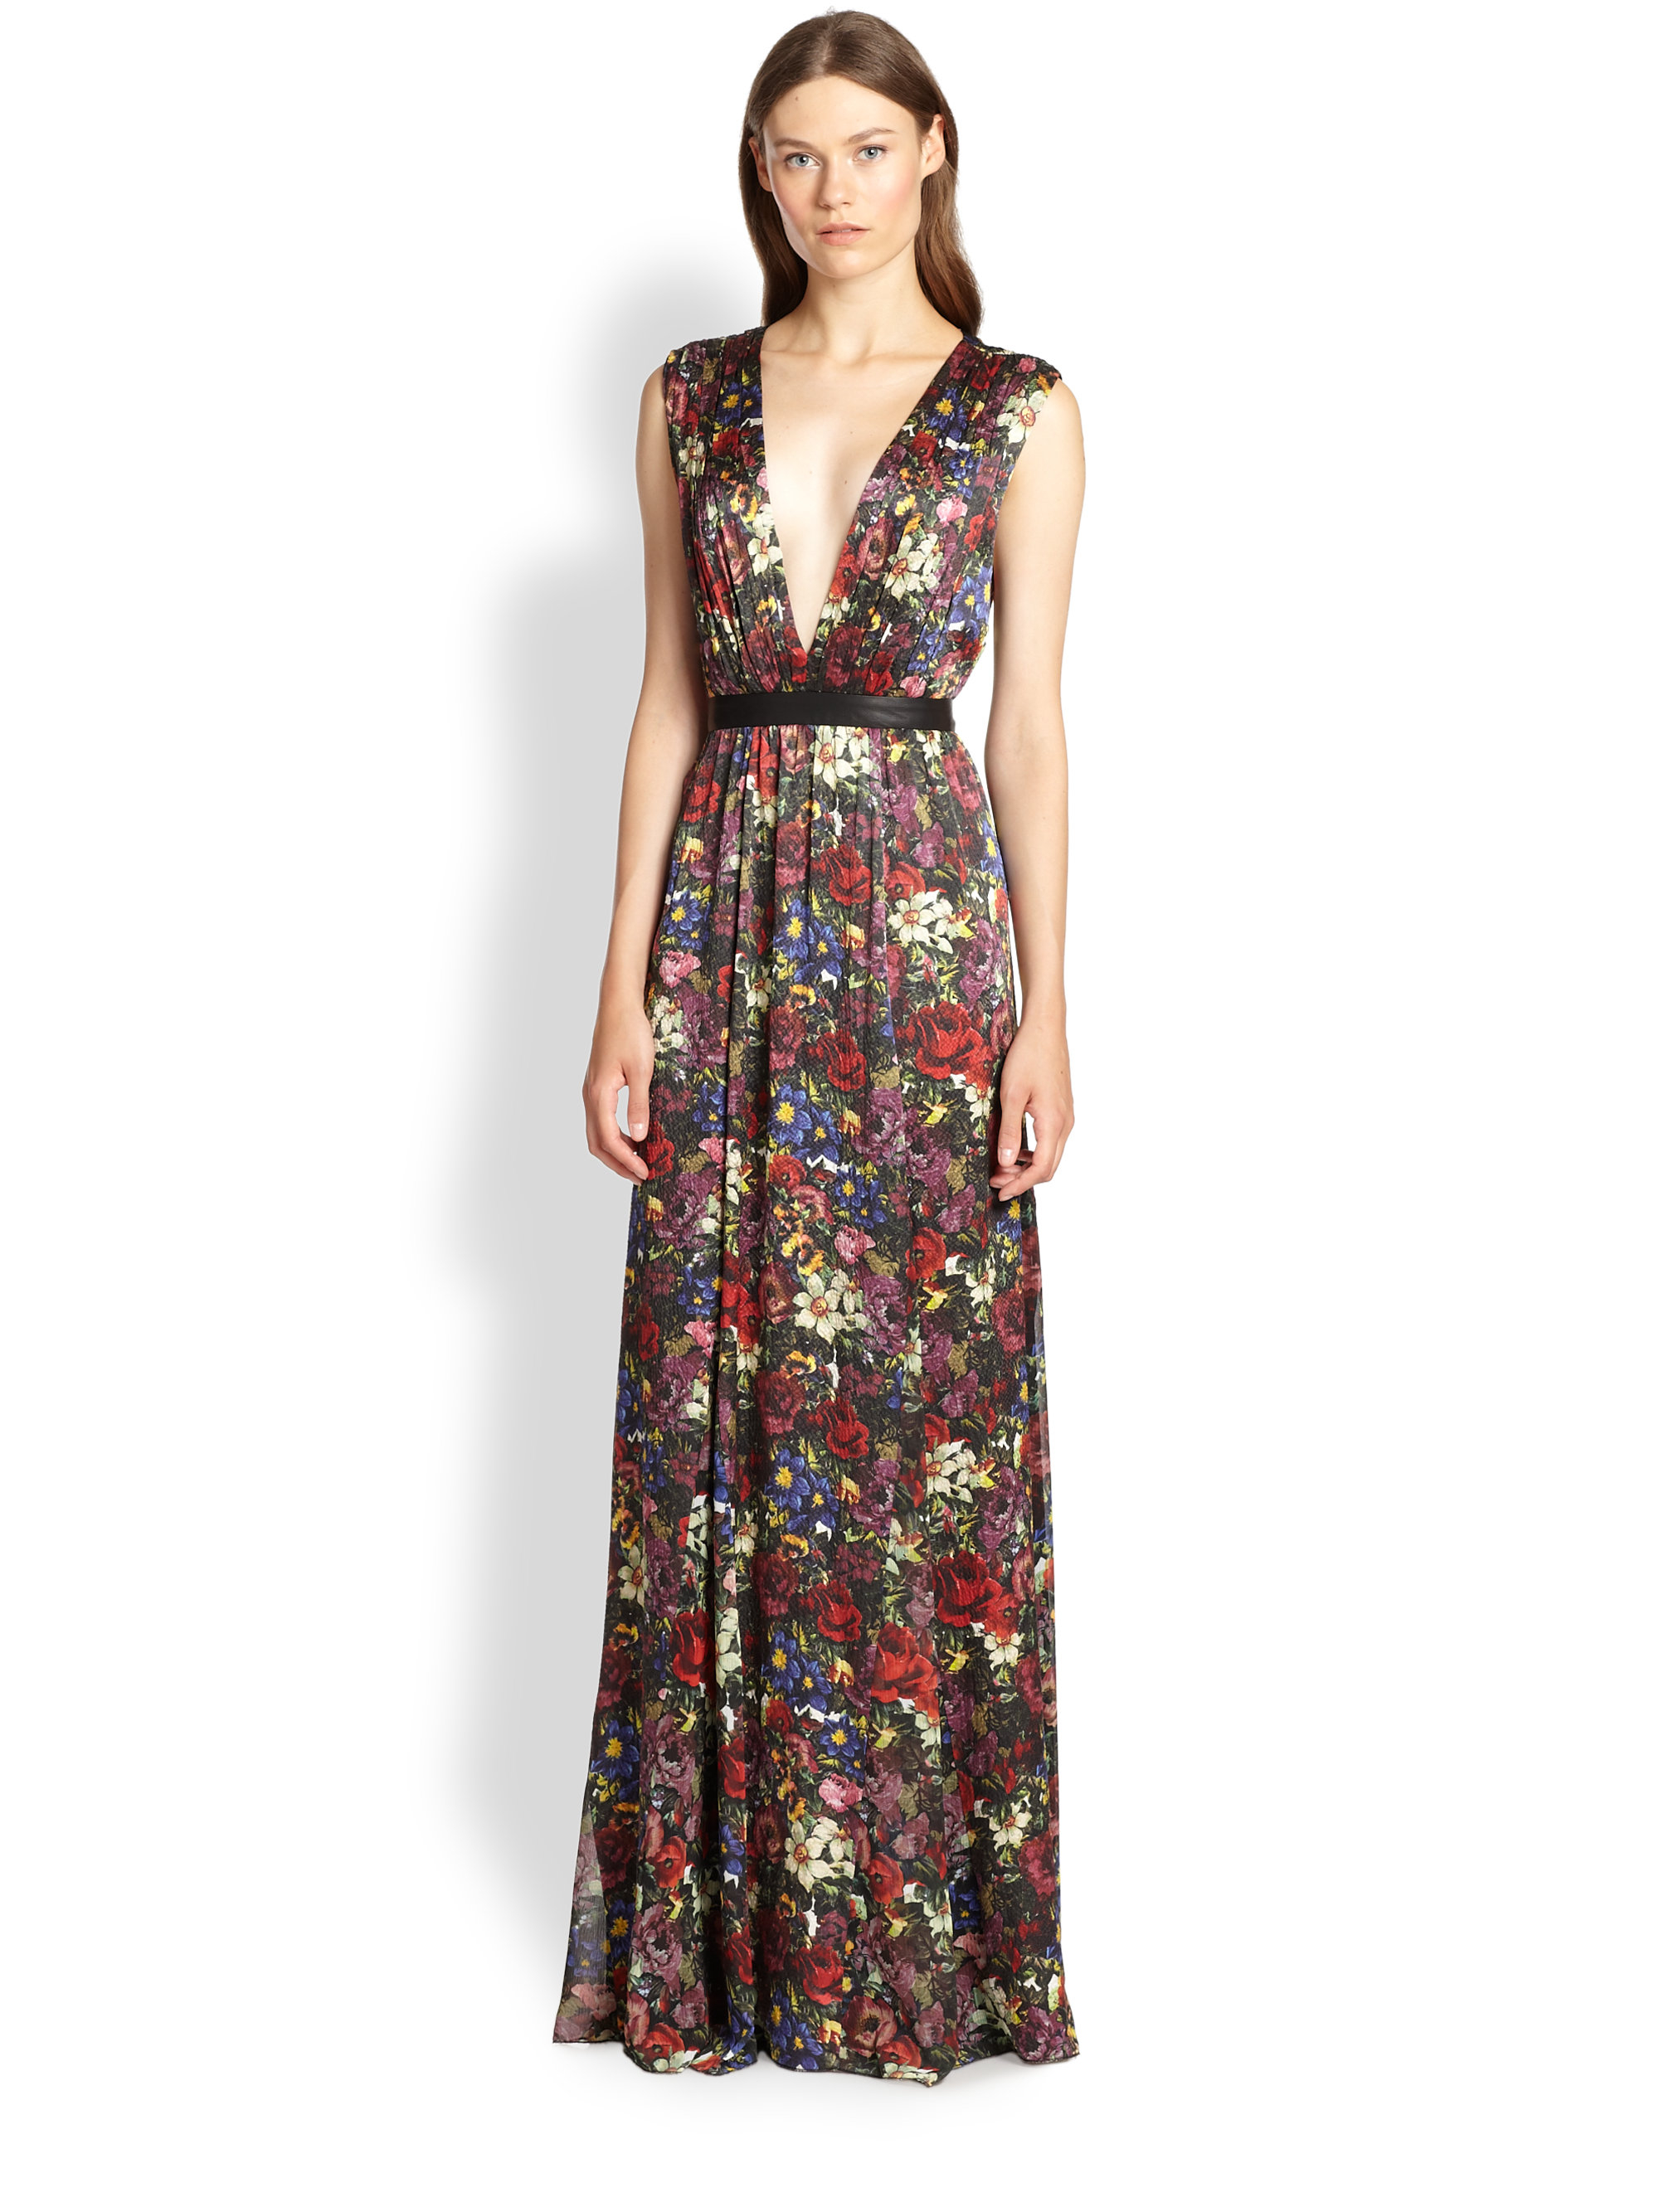 Lyst - Alice + Olivia Triss Leather-Trim Maxi Dress